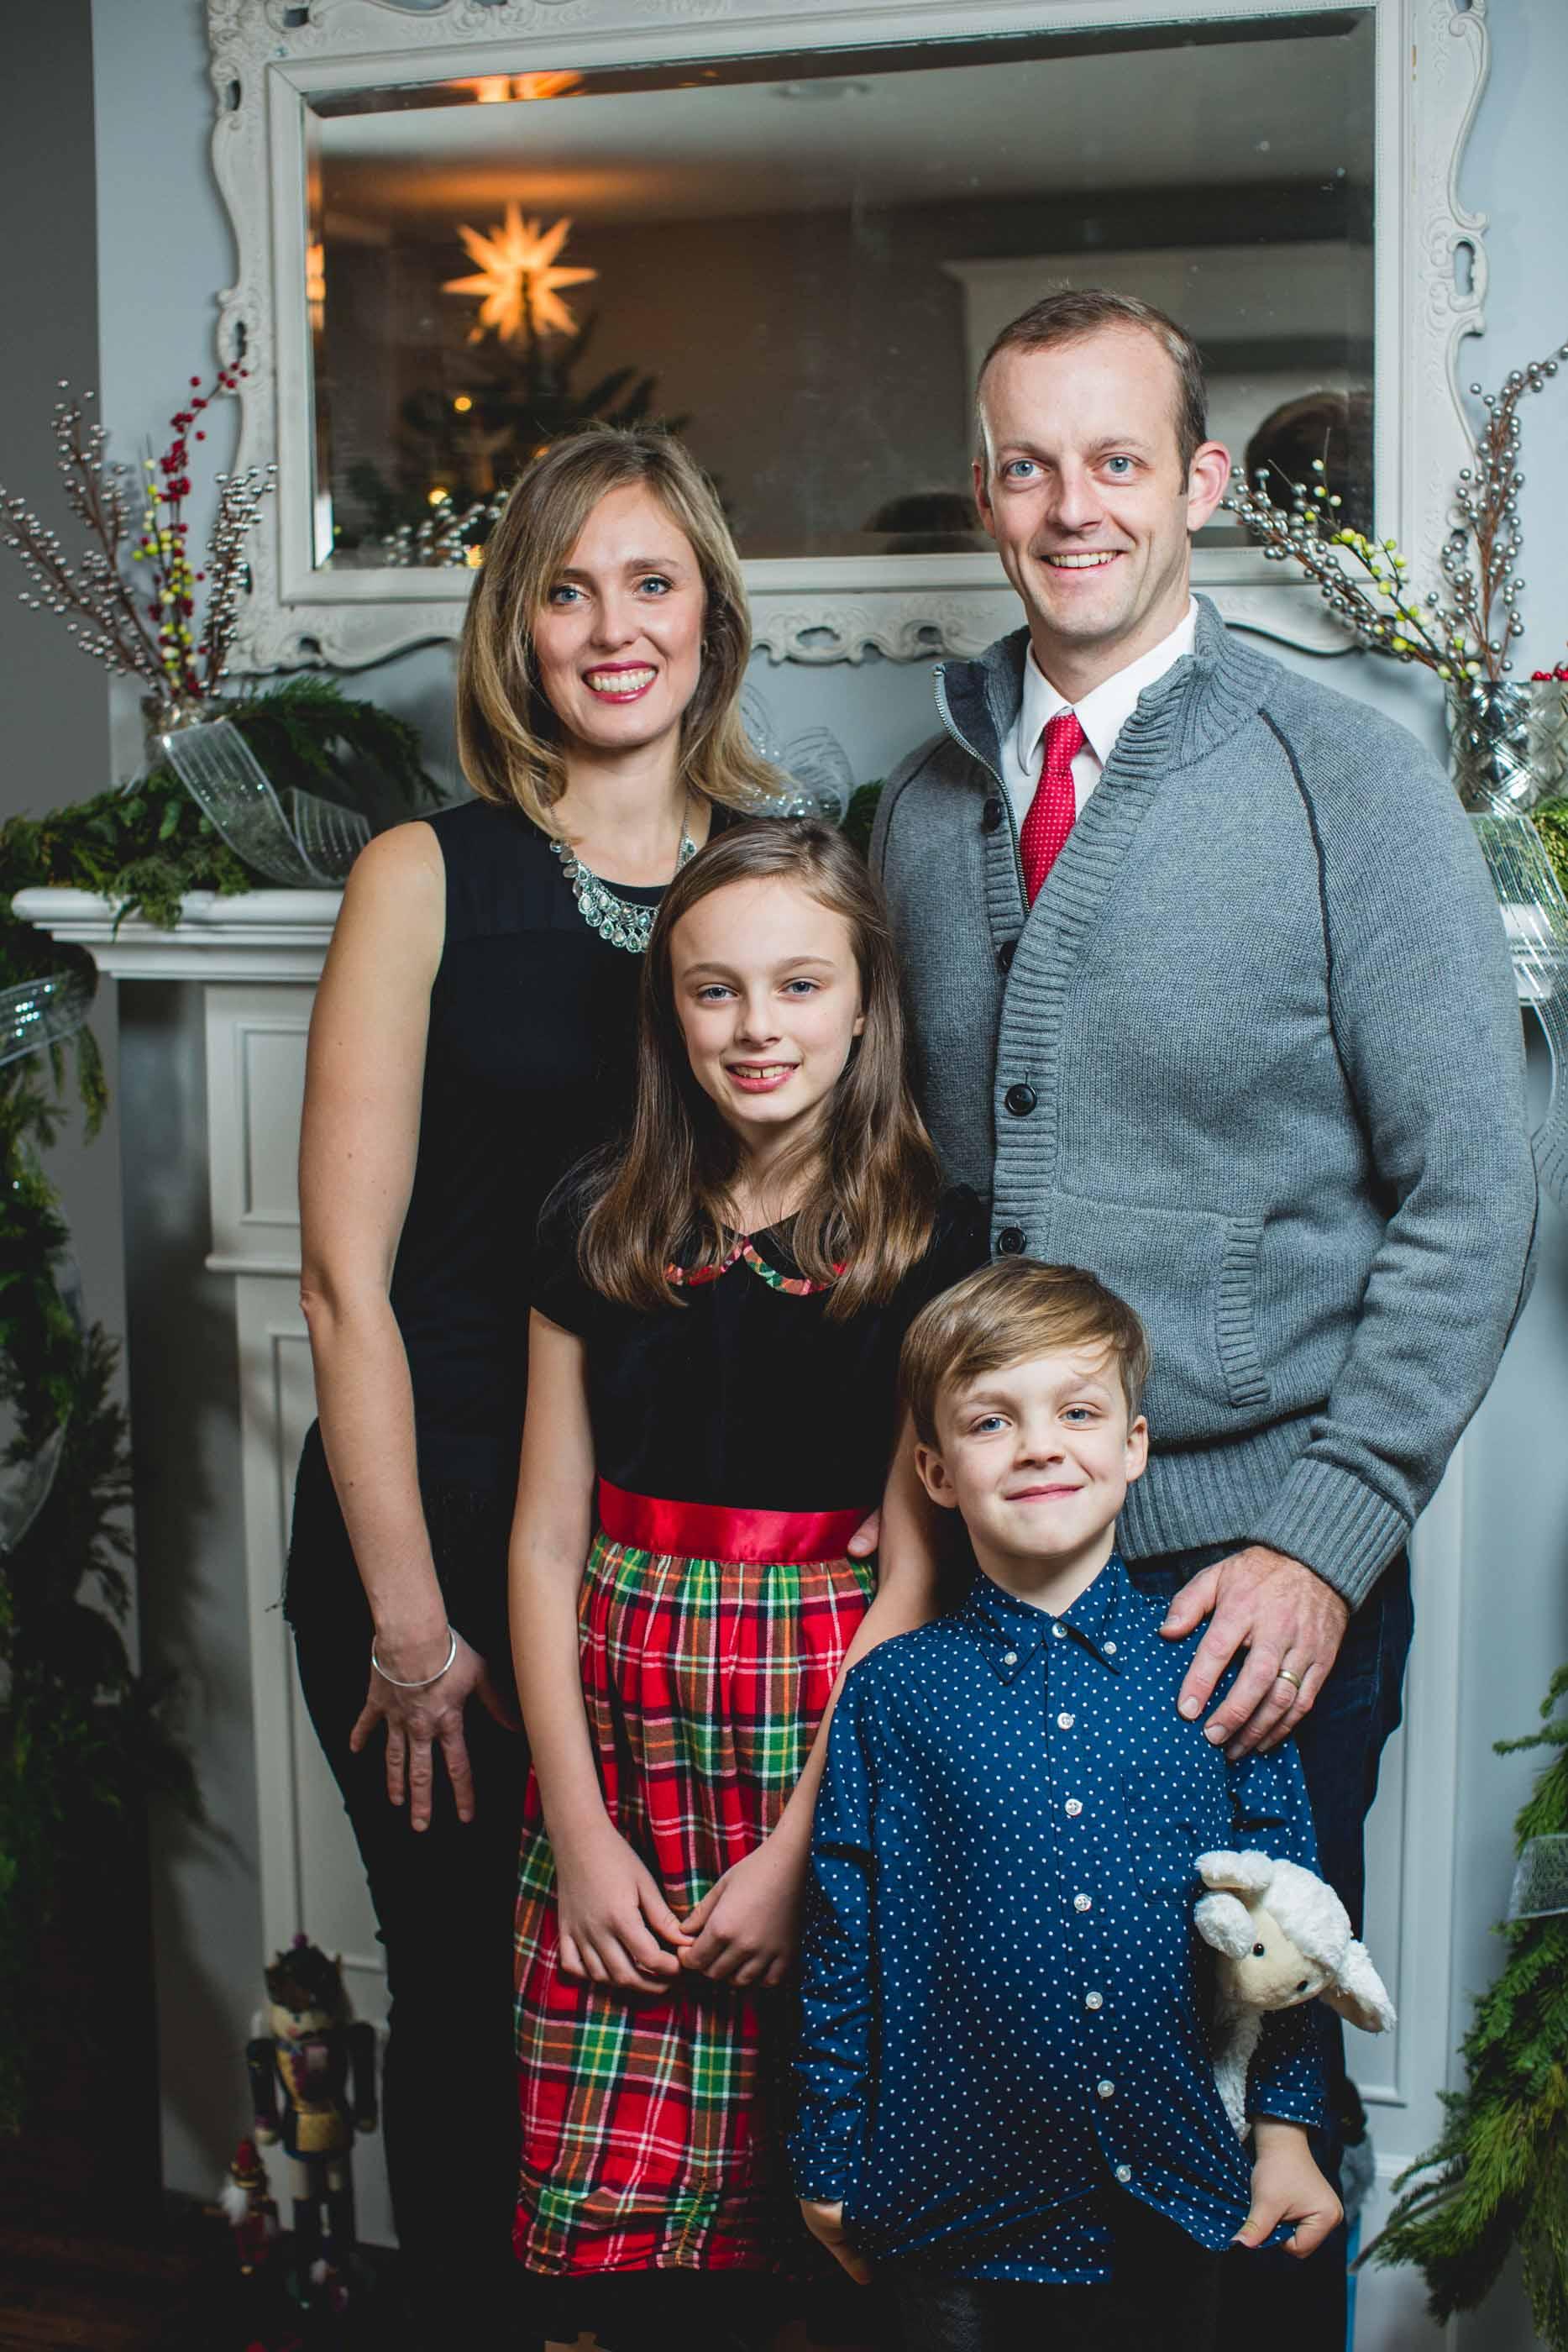 Family-Photographer-Beverly-MA-1-3.jpg